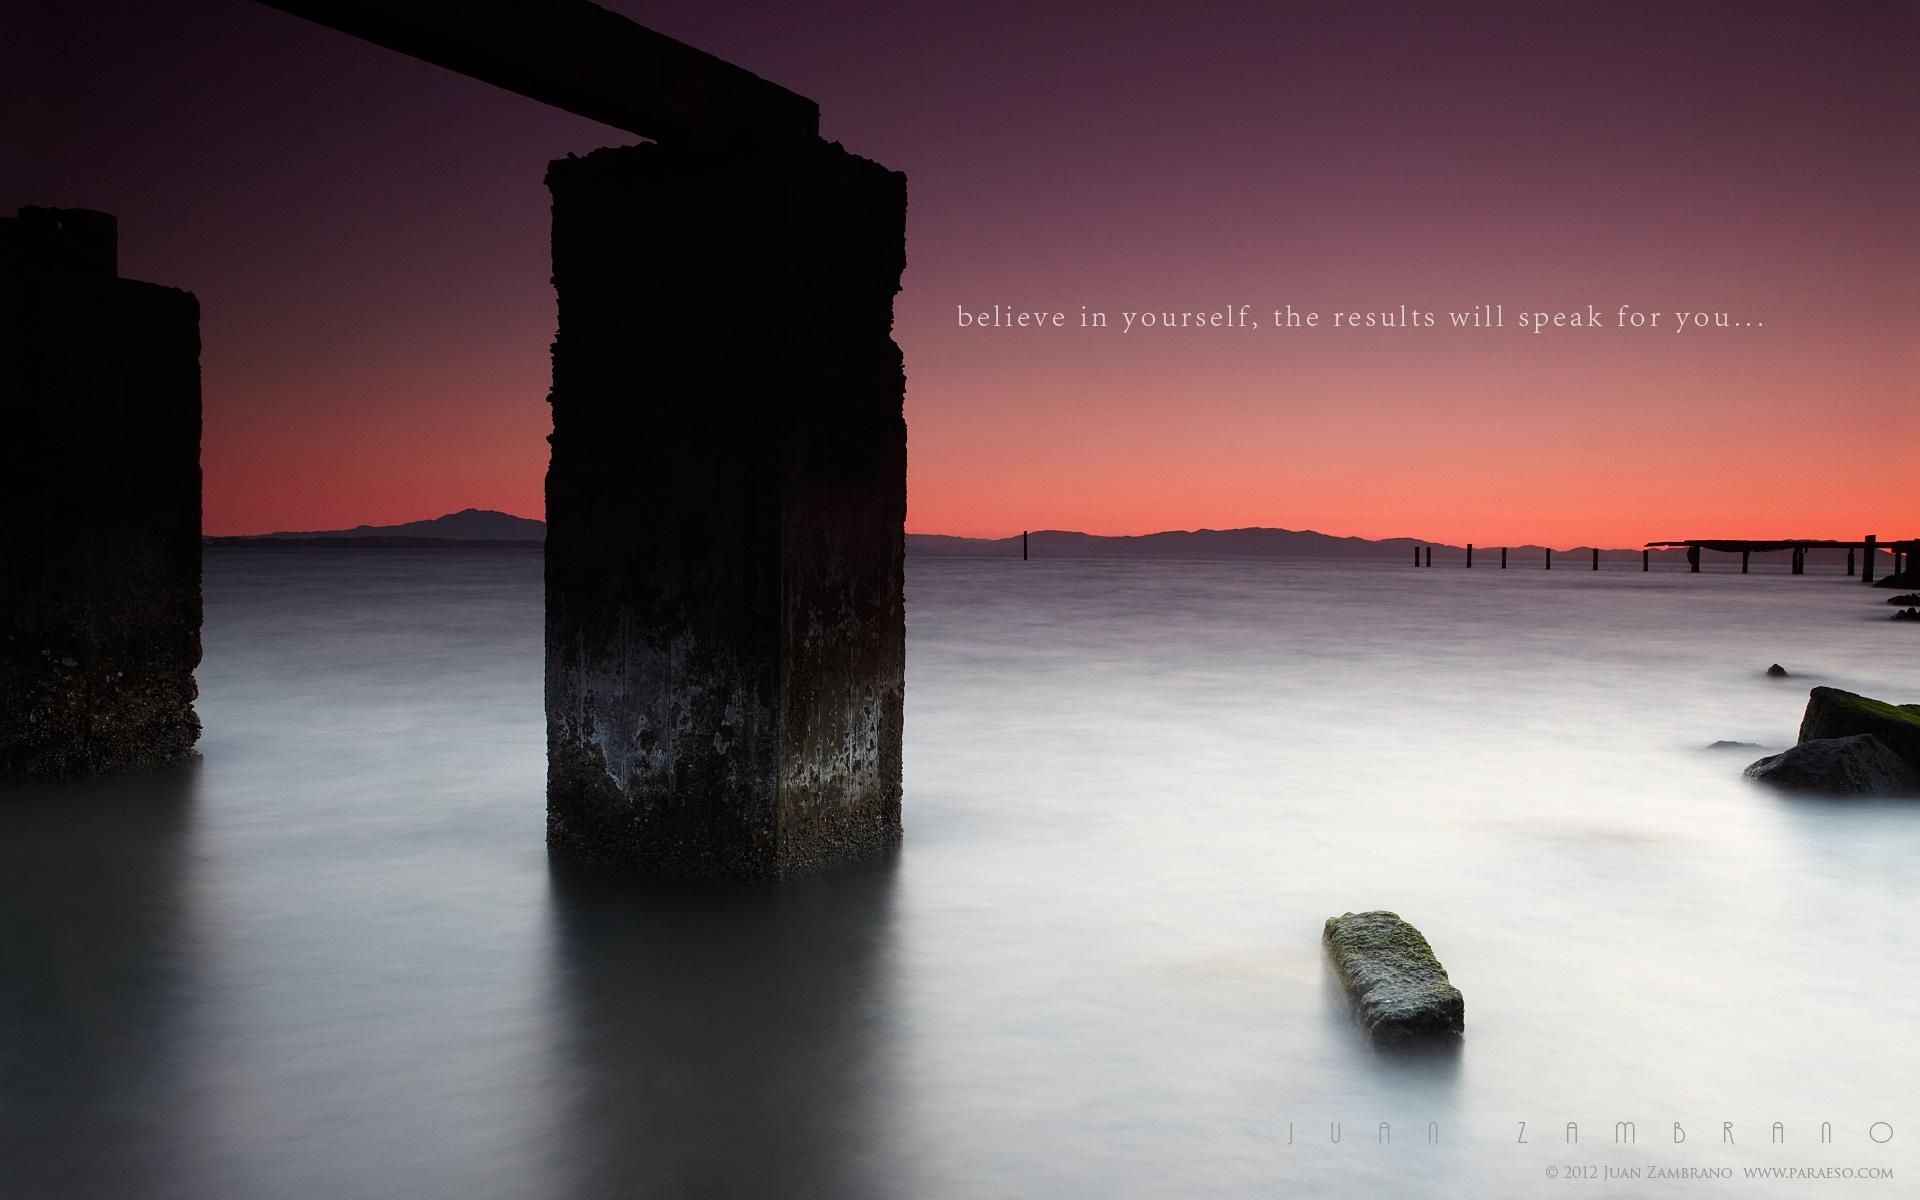 background images, inspirational wallpaper